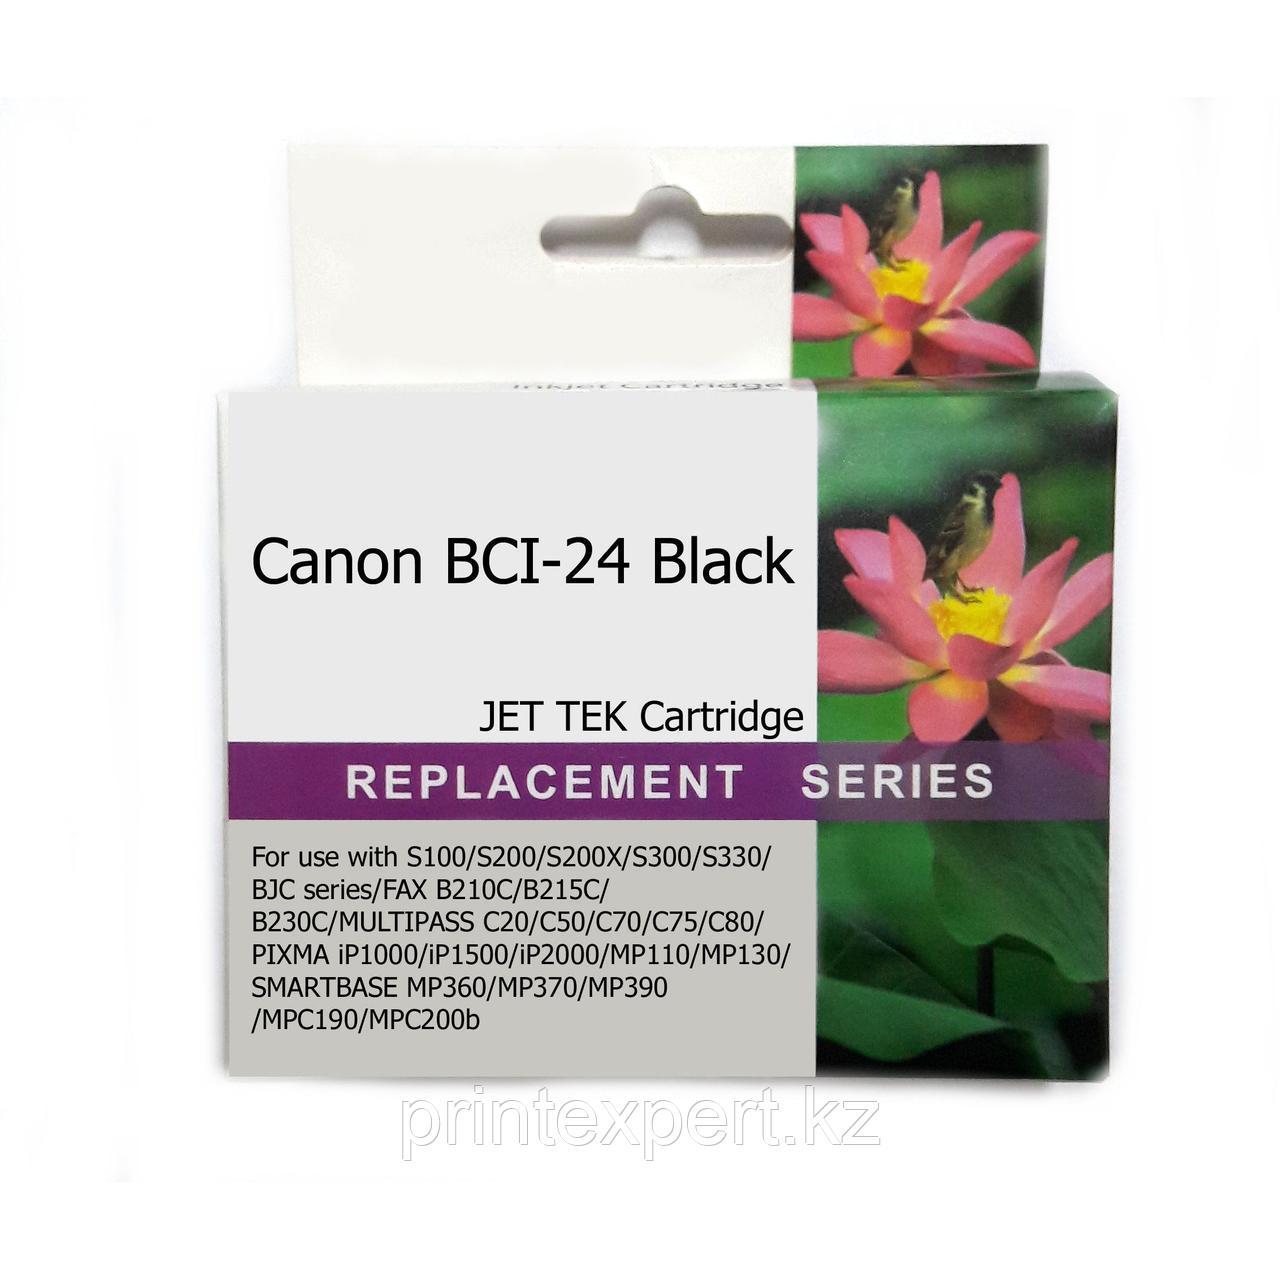 Картридж Canon BCI-24 Black JET TEK